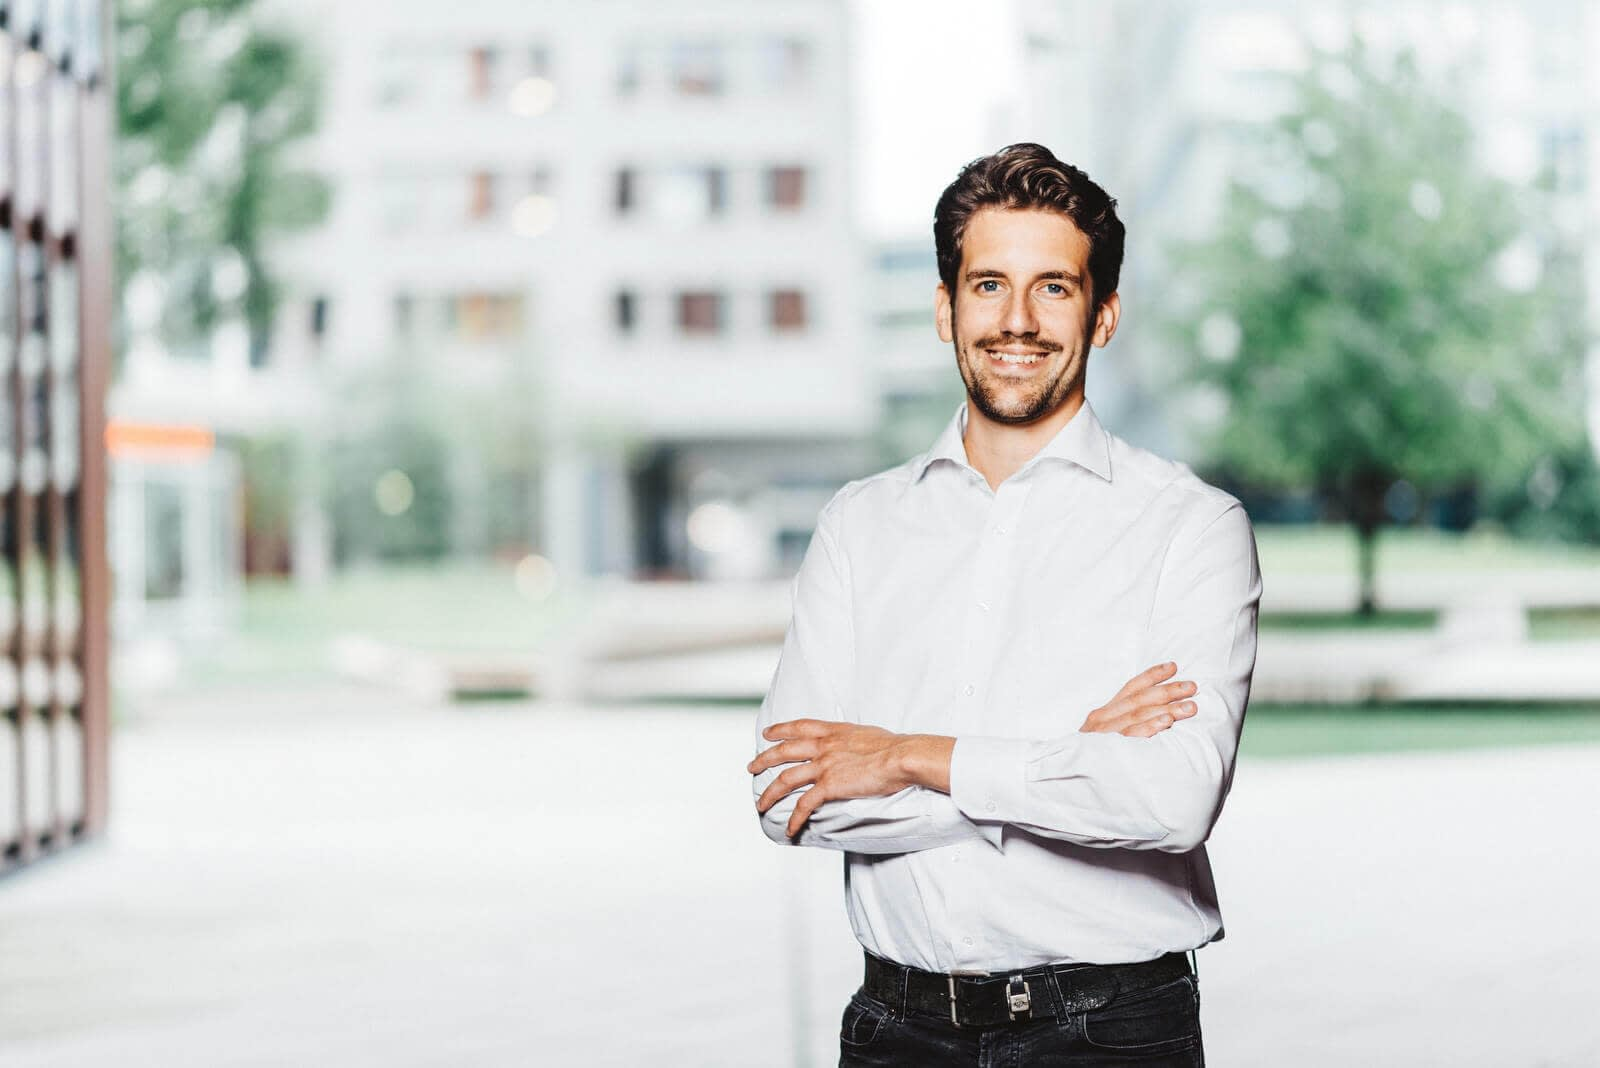 business fotograf hamburg beratung netzplanung corporate selbststaendig unternehmer